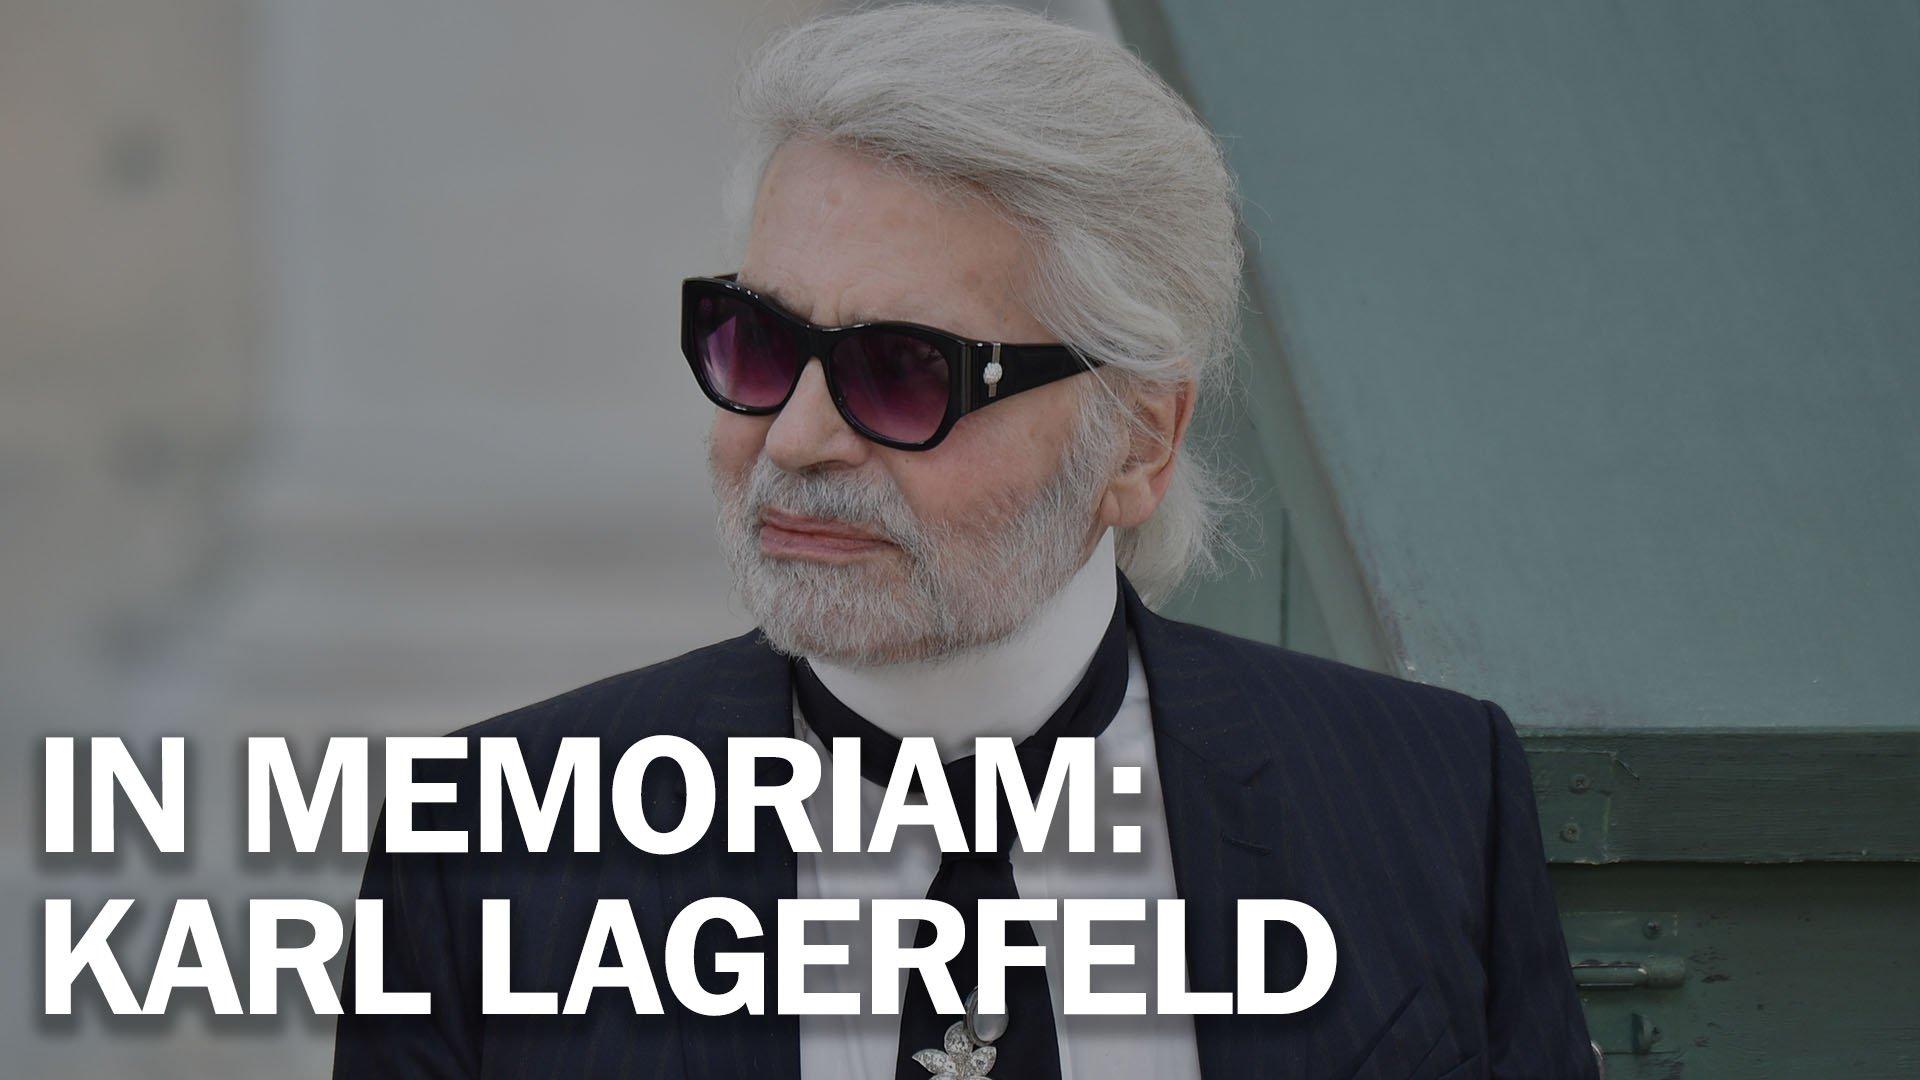 Legendary fashion designer Karl Lagerfeld dies in Paris aged 85 https://t.co/HOQ33JSVqu https://t.co/6dDtcuww0F